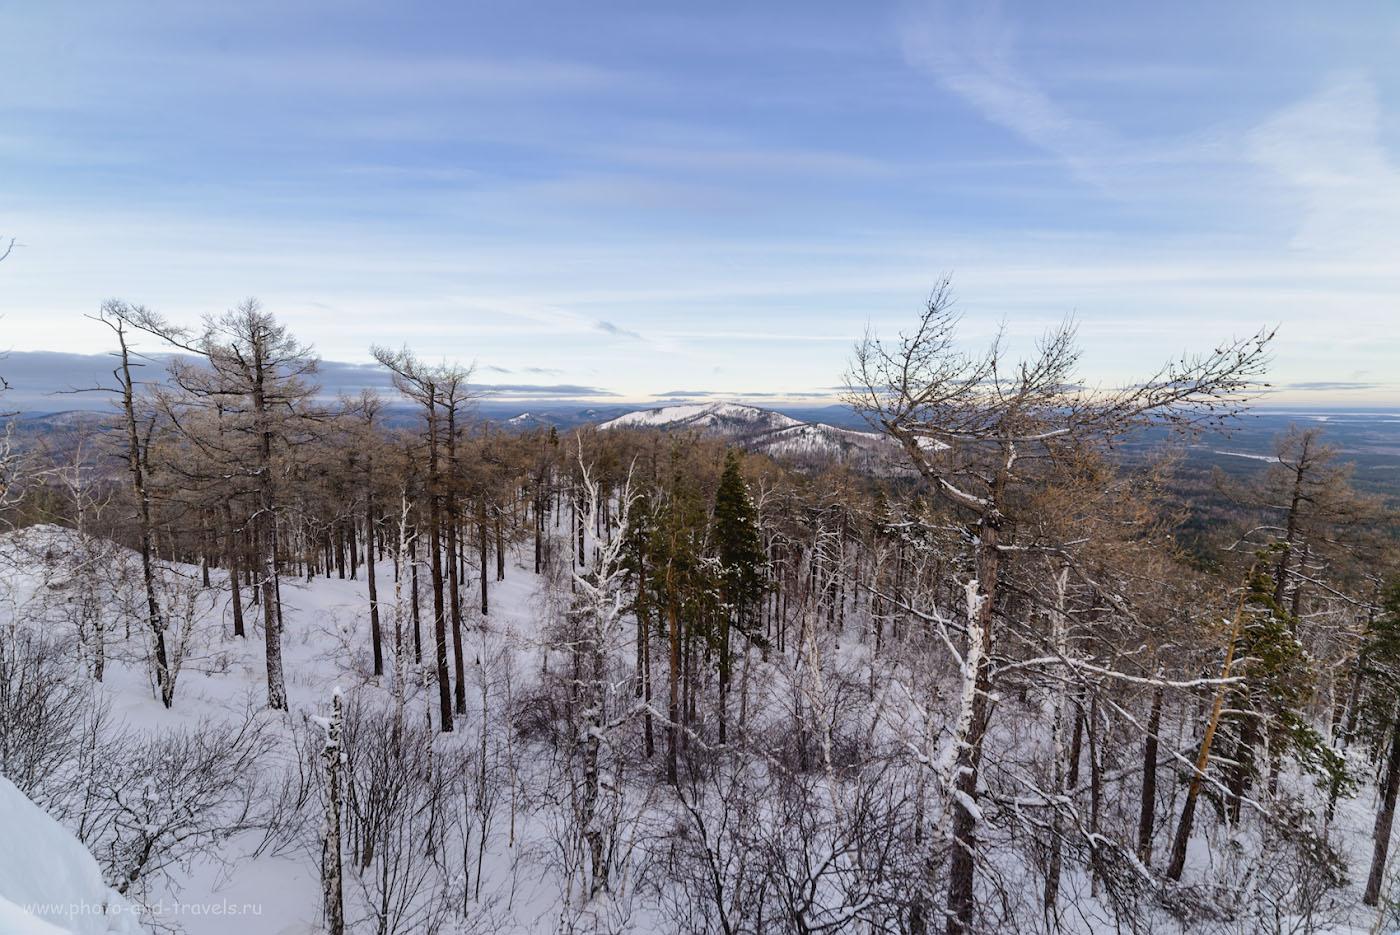 Фото 12. Вид с вершины Сугомака на Егозу. 1/100, -0.67, 8.0, 100, 14.